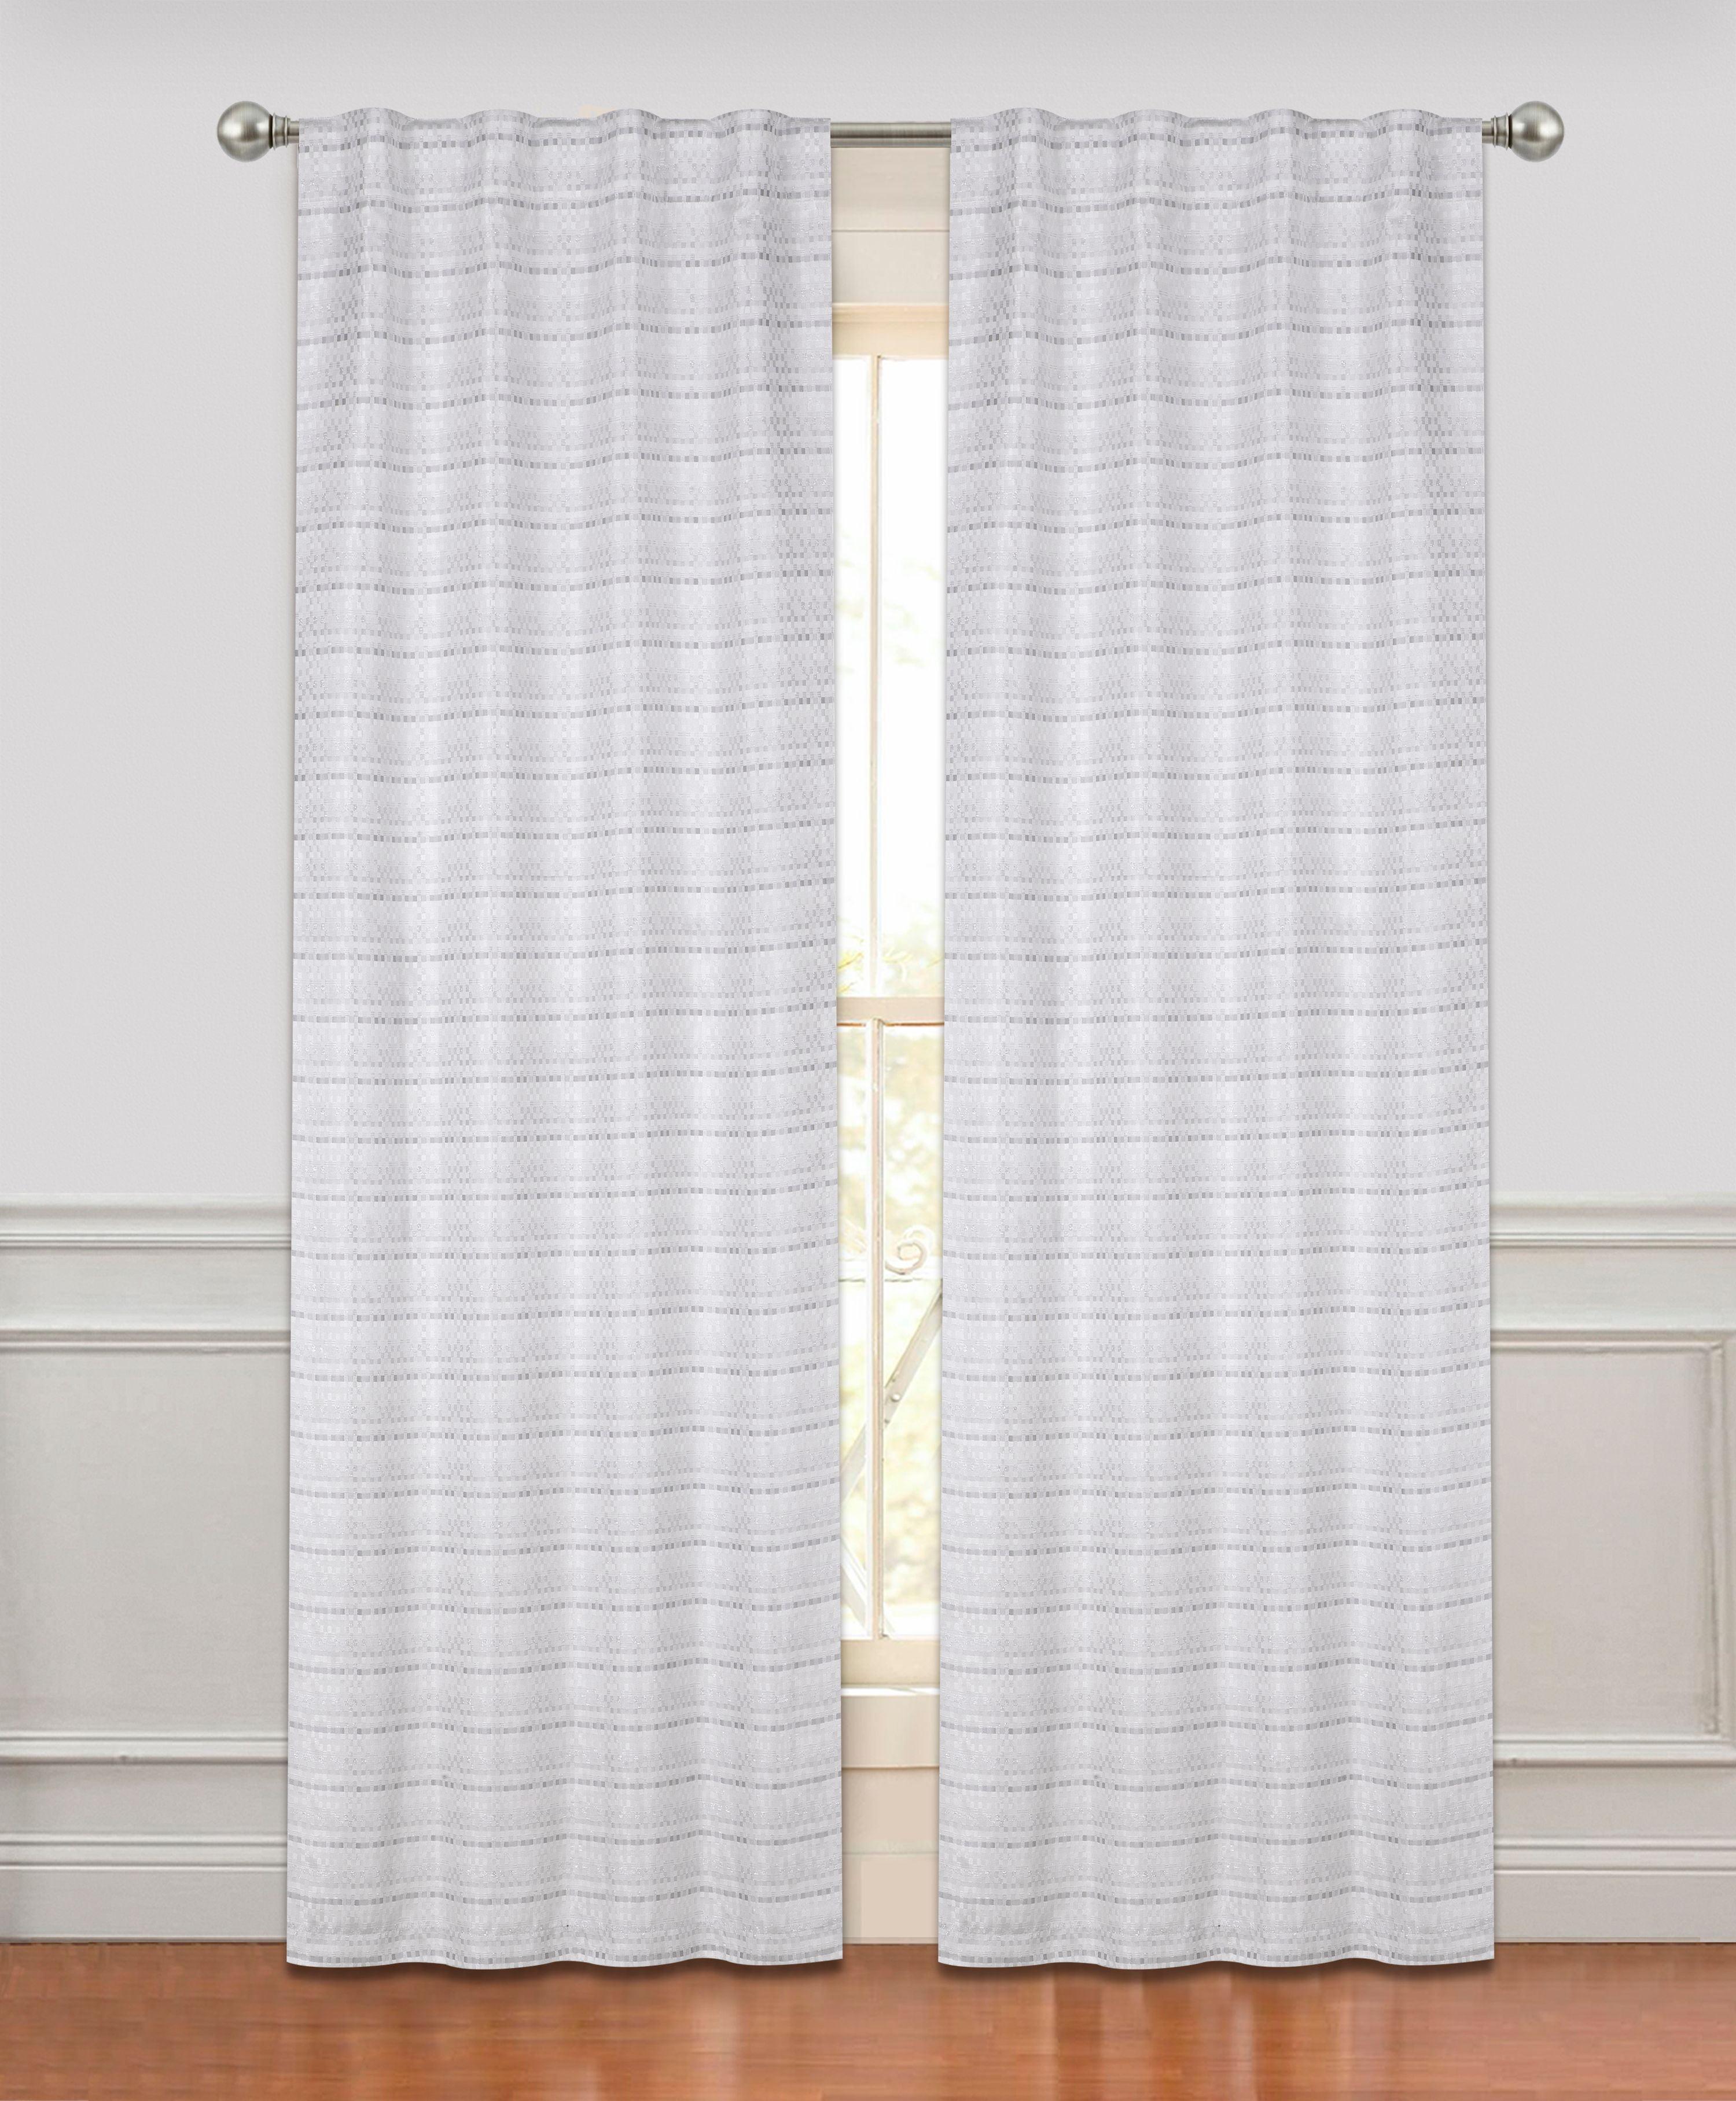 Dainty Home Rodeo Room Darkening Rod Pocket Window Curtain Panel Pair Walmart Com Walmart Com